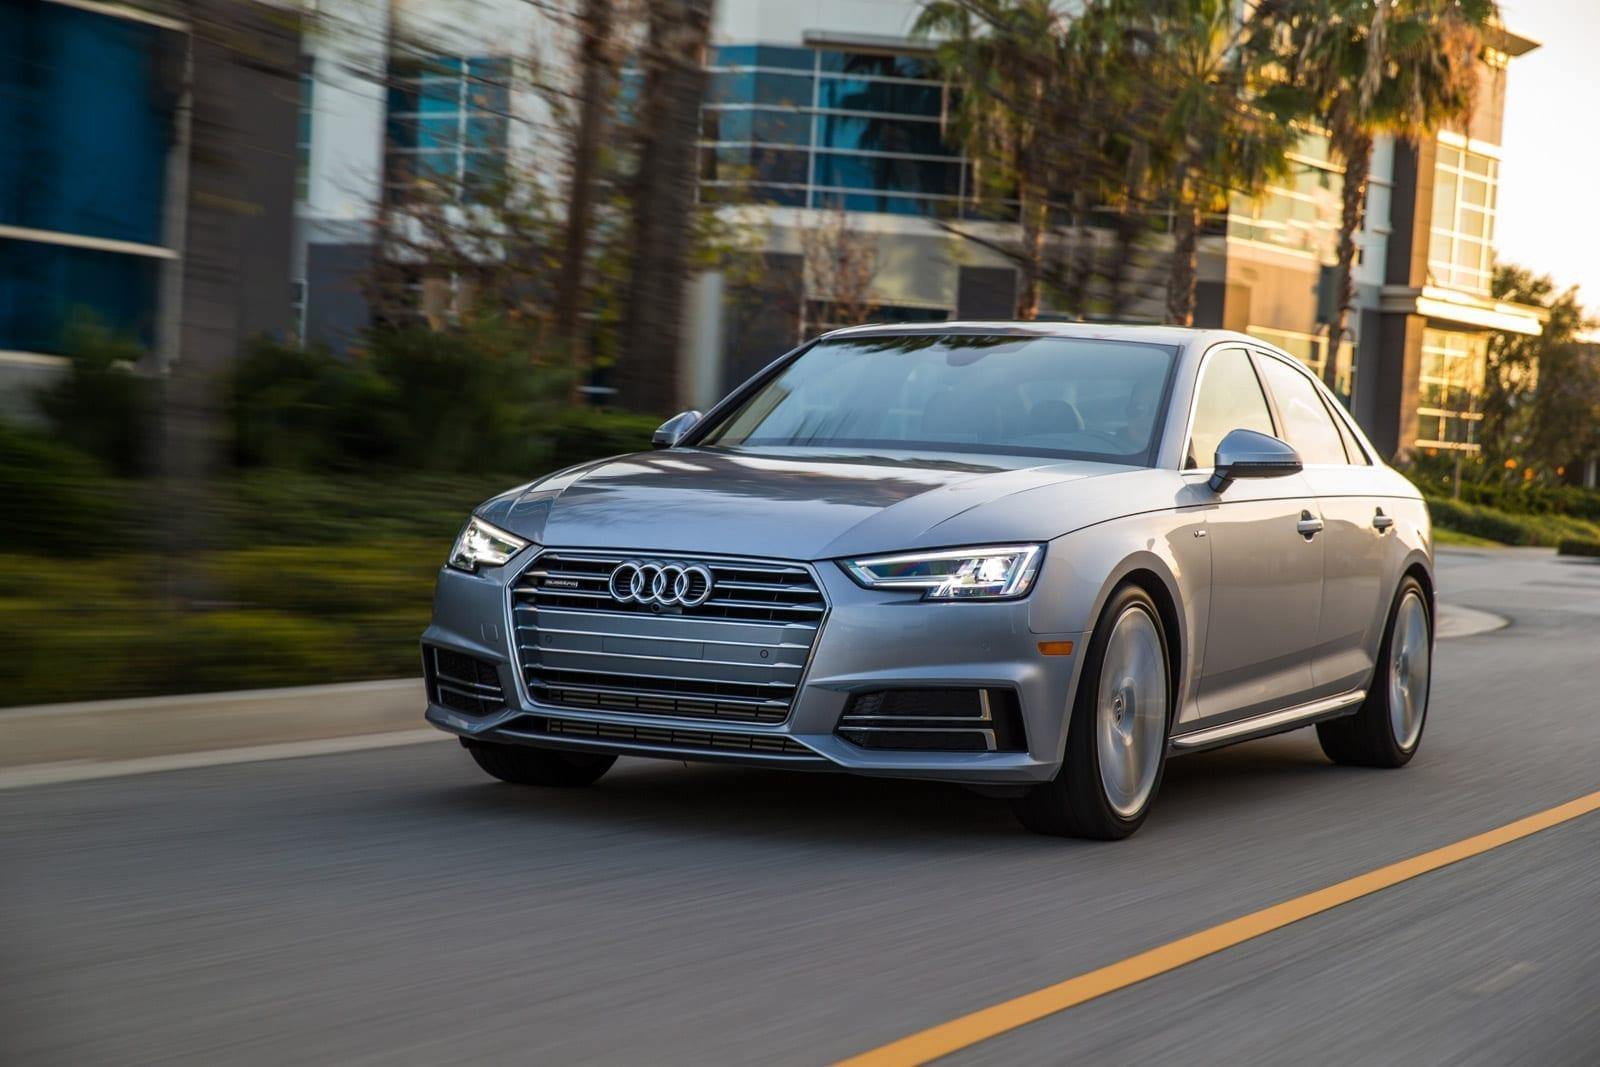 Audi A4 Sales Reports